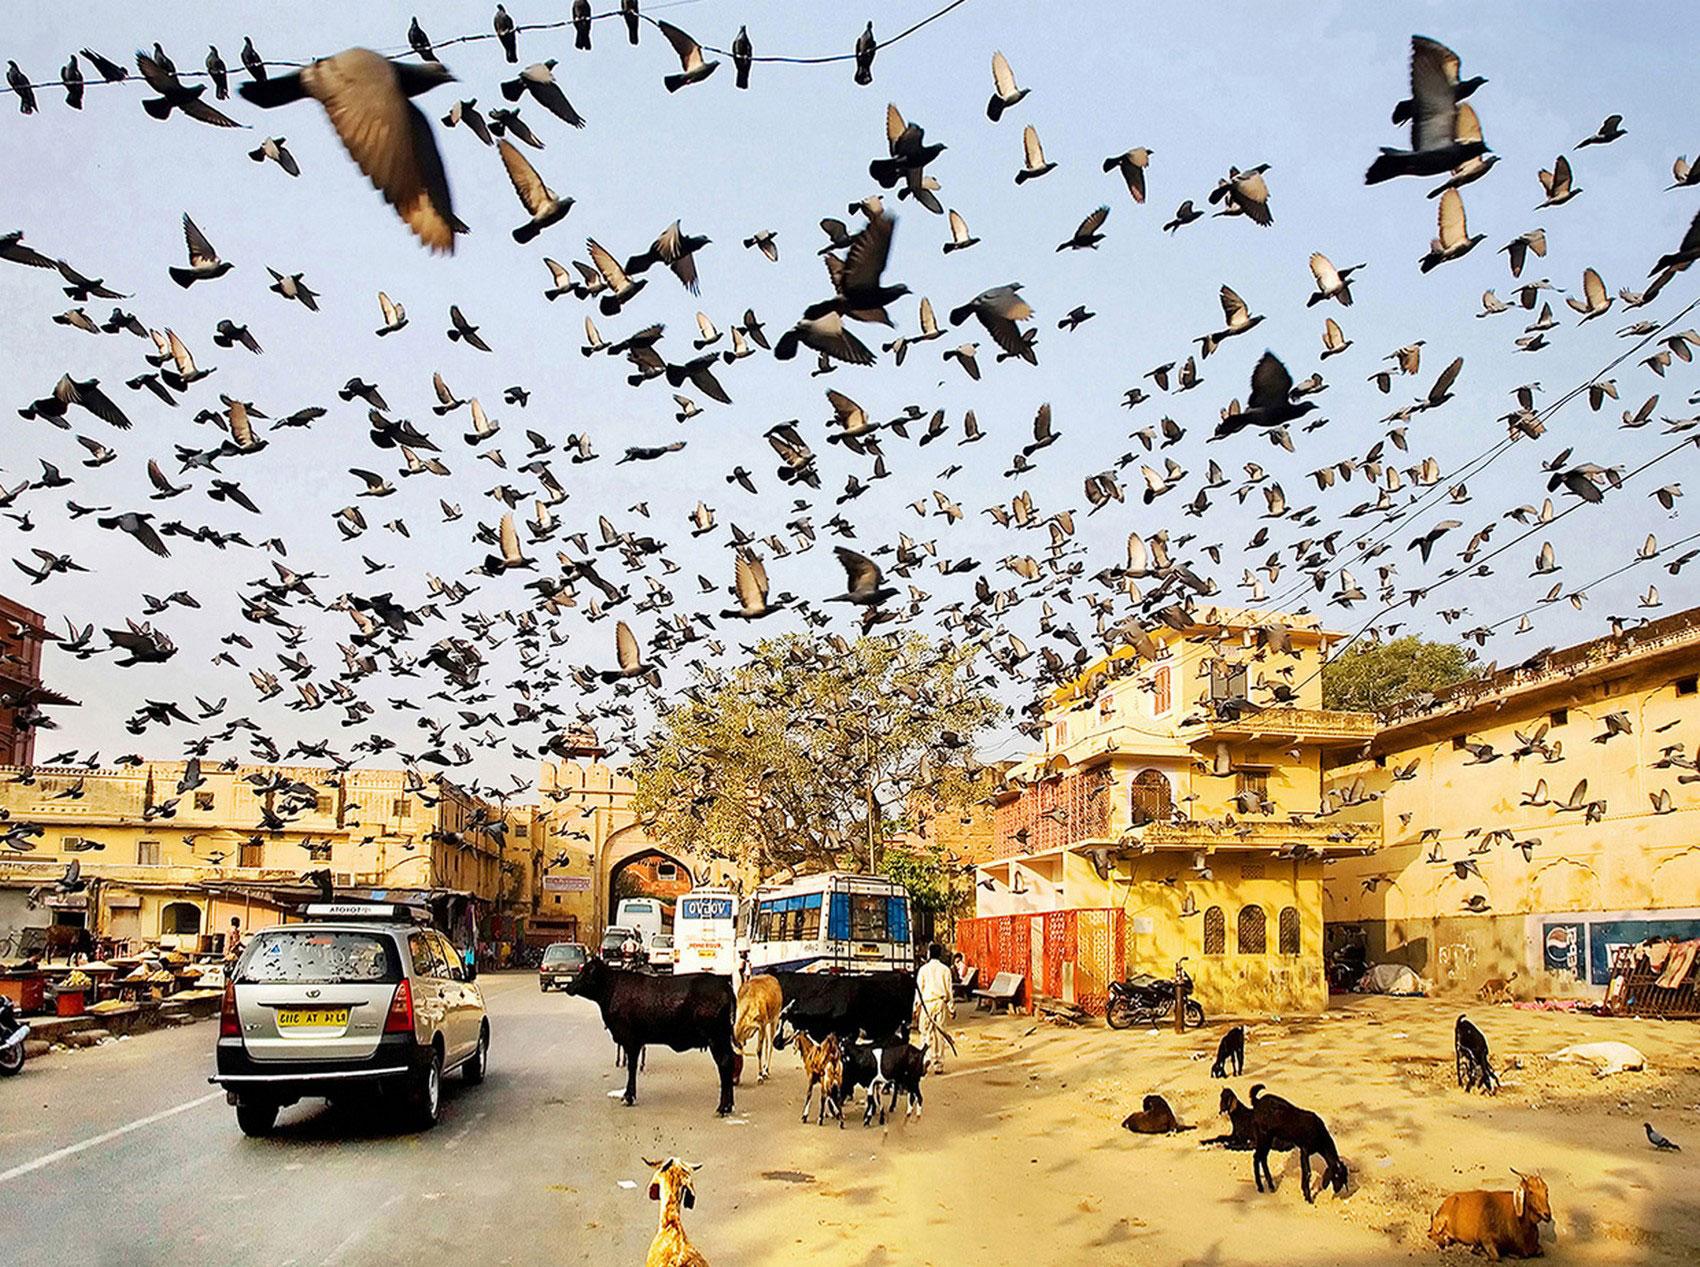 птицы в Джайпур, фотоконкурс